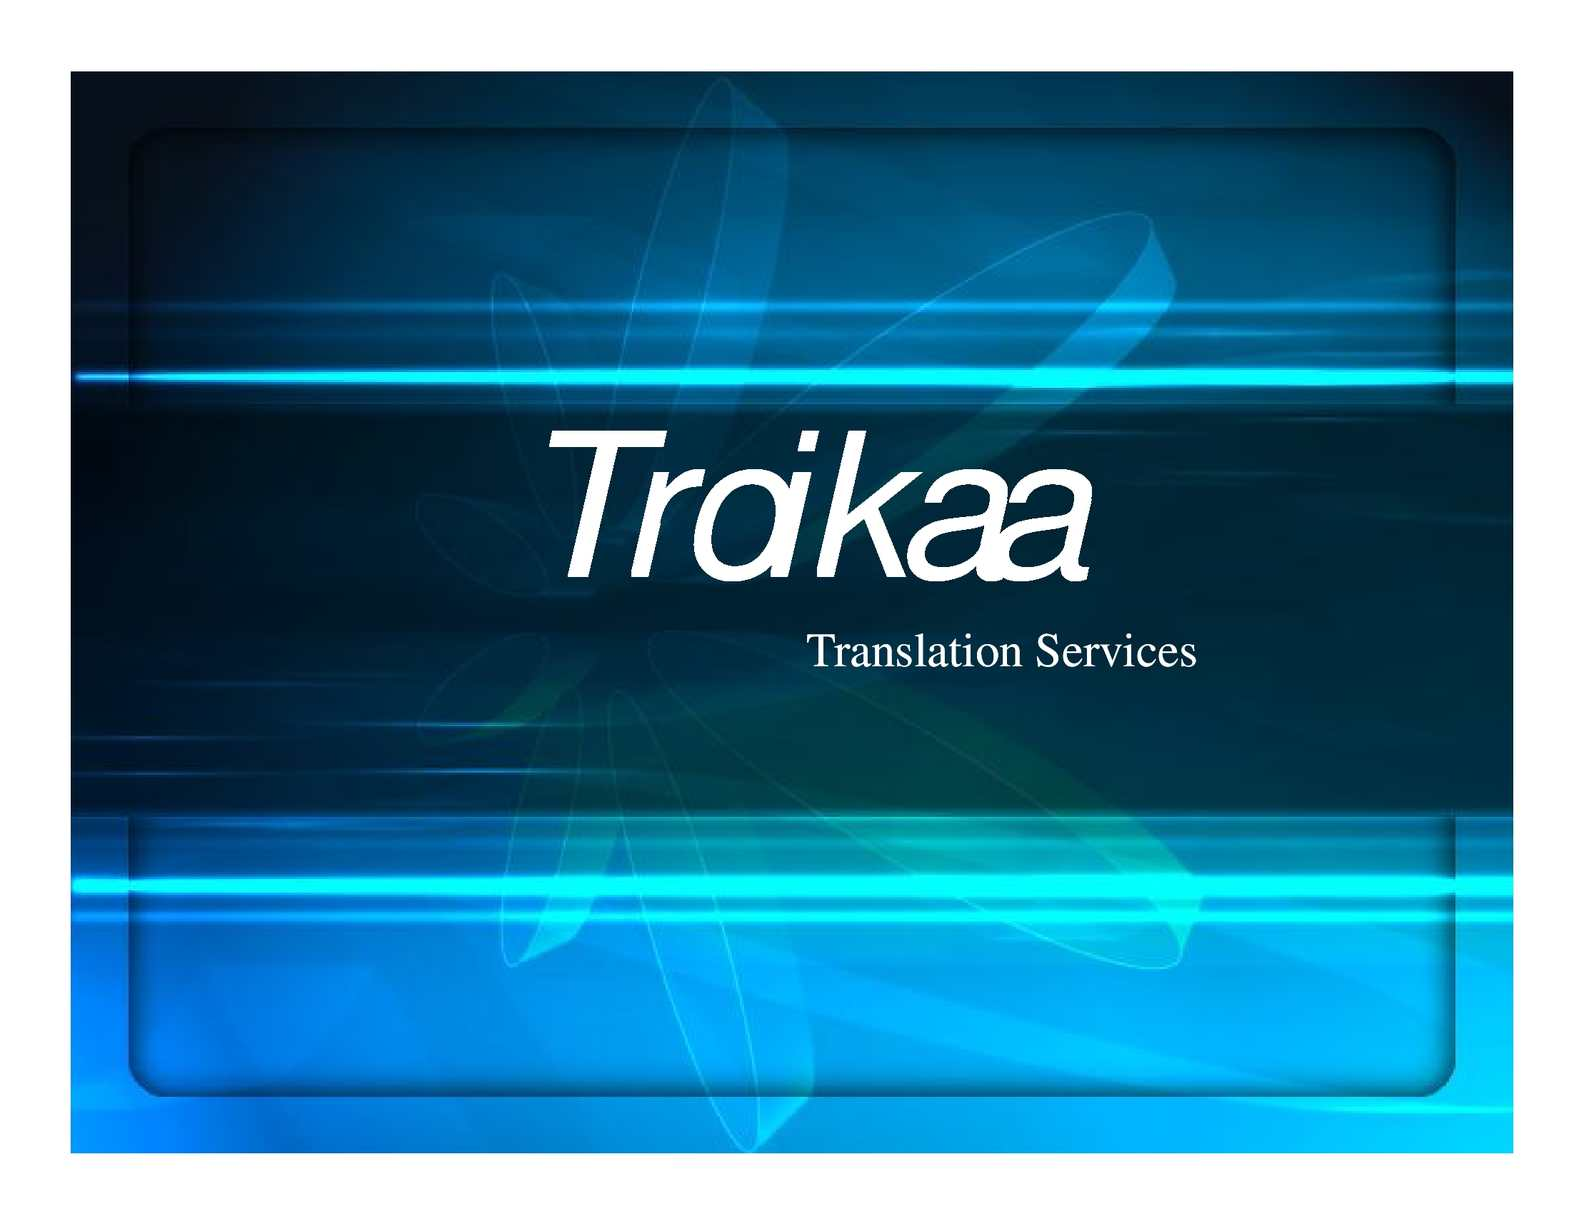 Troikaa Translation Services